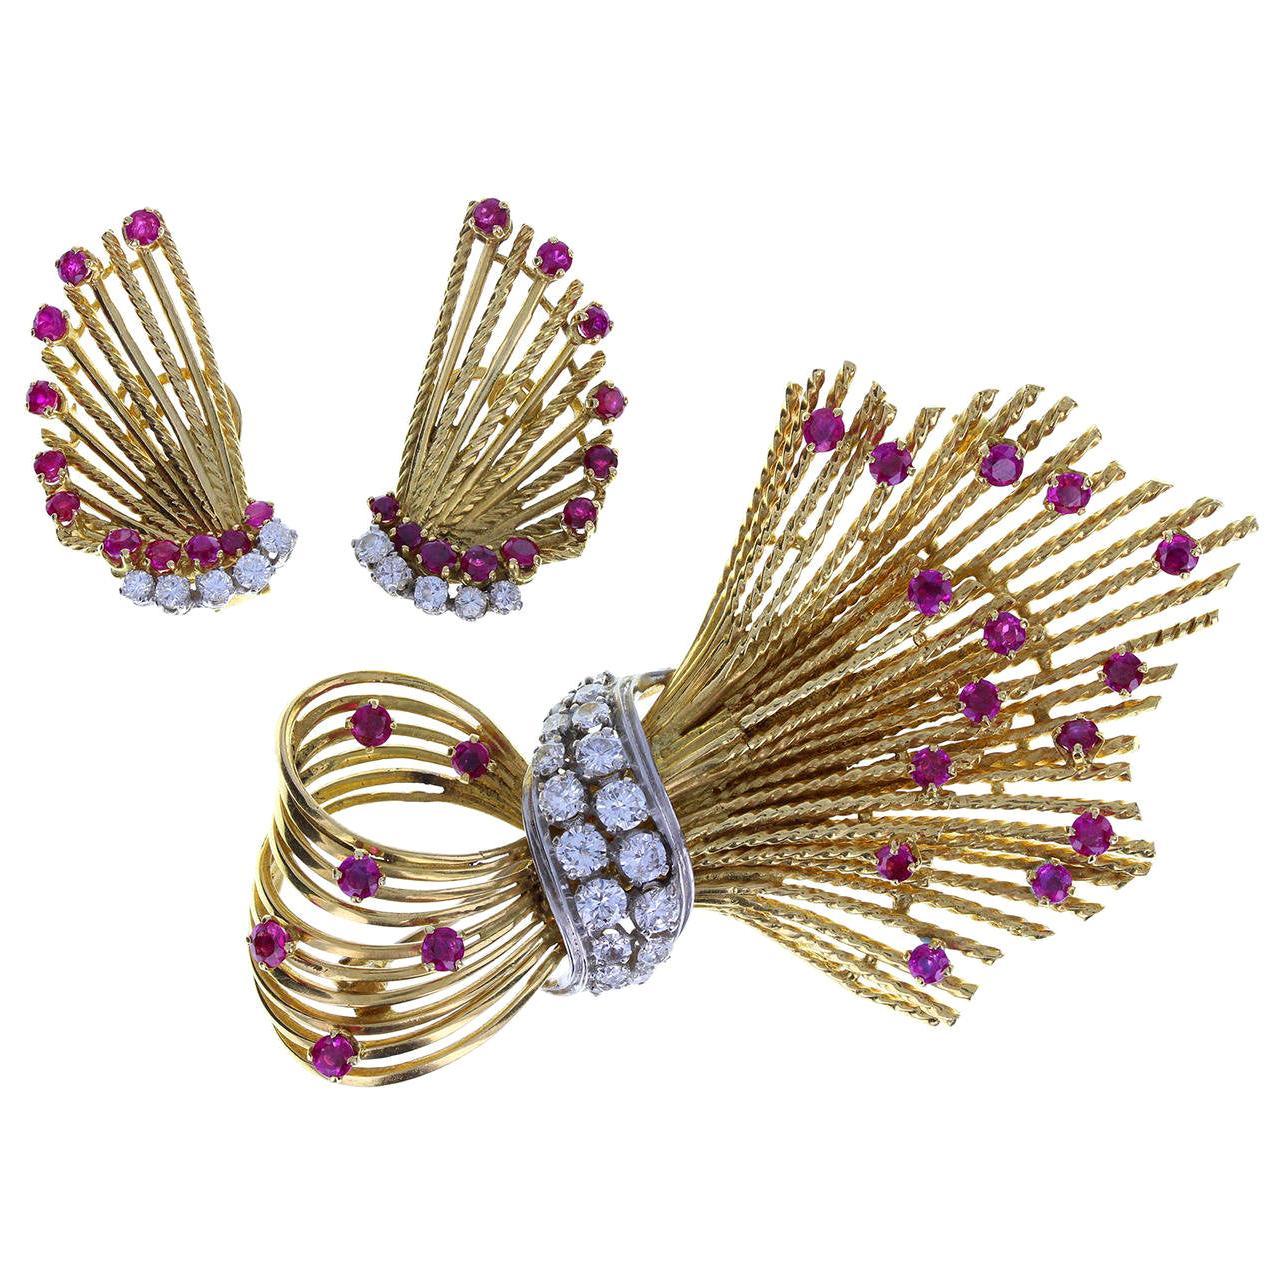 Kutchinsky Ruby Diamond Gold Spray Brooch and Earrings